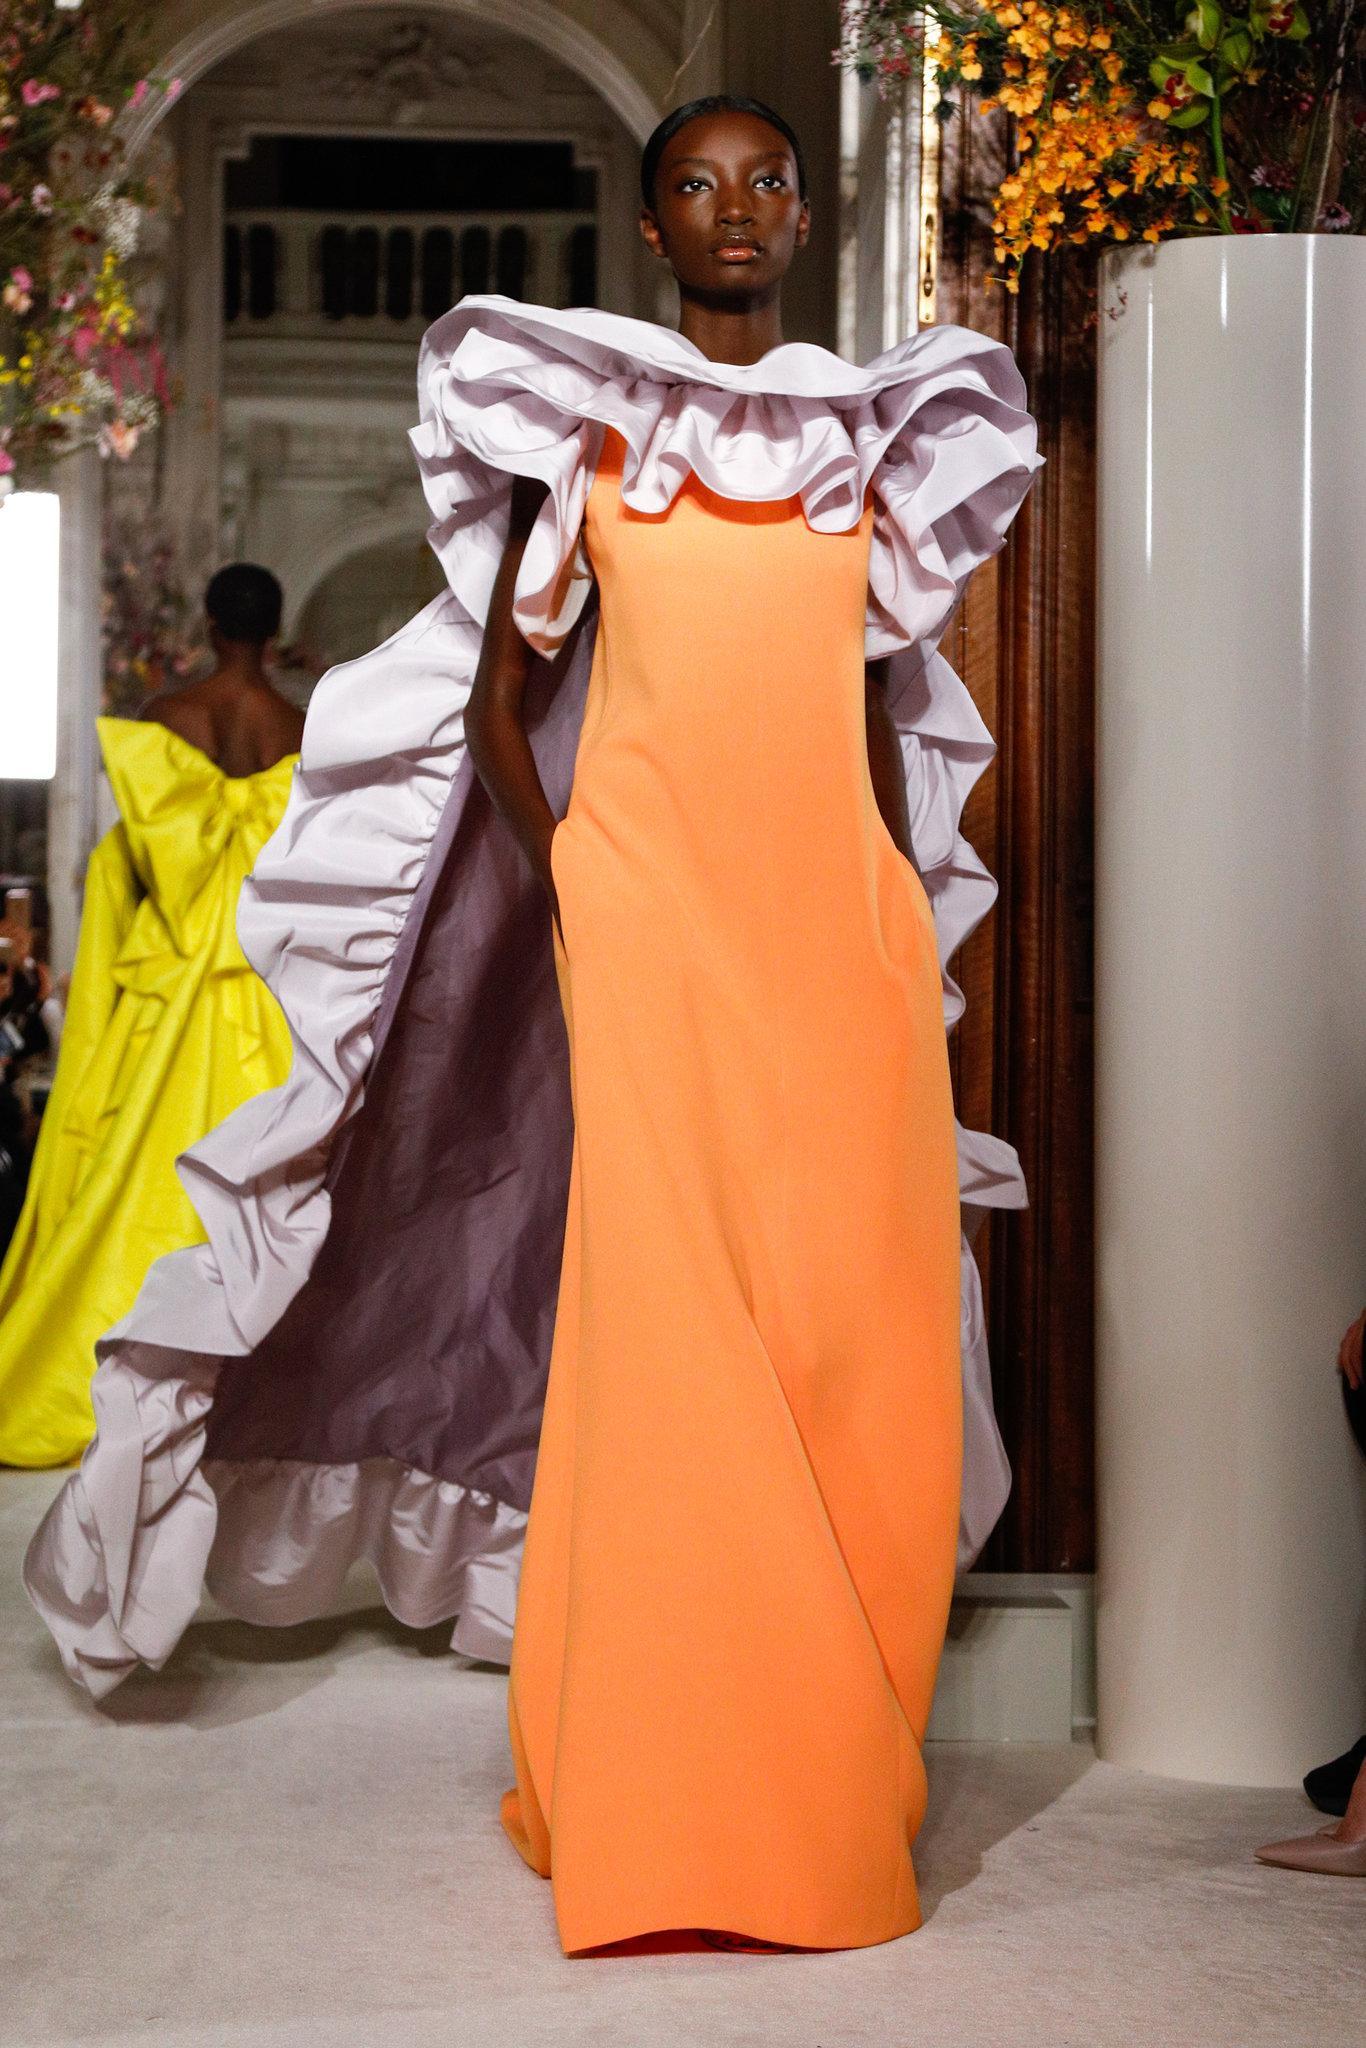 Valen-spring-2019-couture-slide-UQEW-superJumbo.jpg